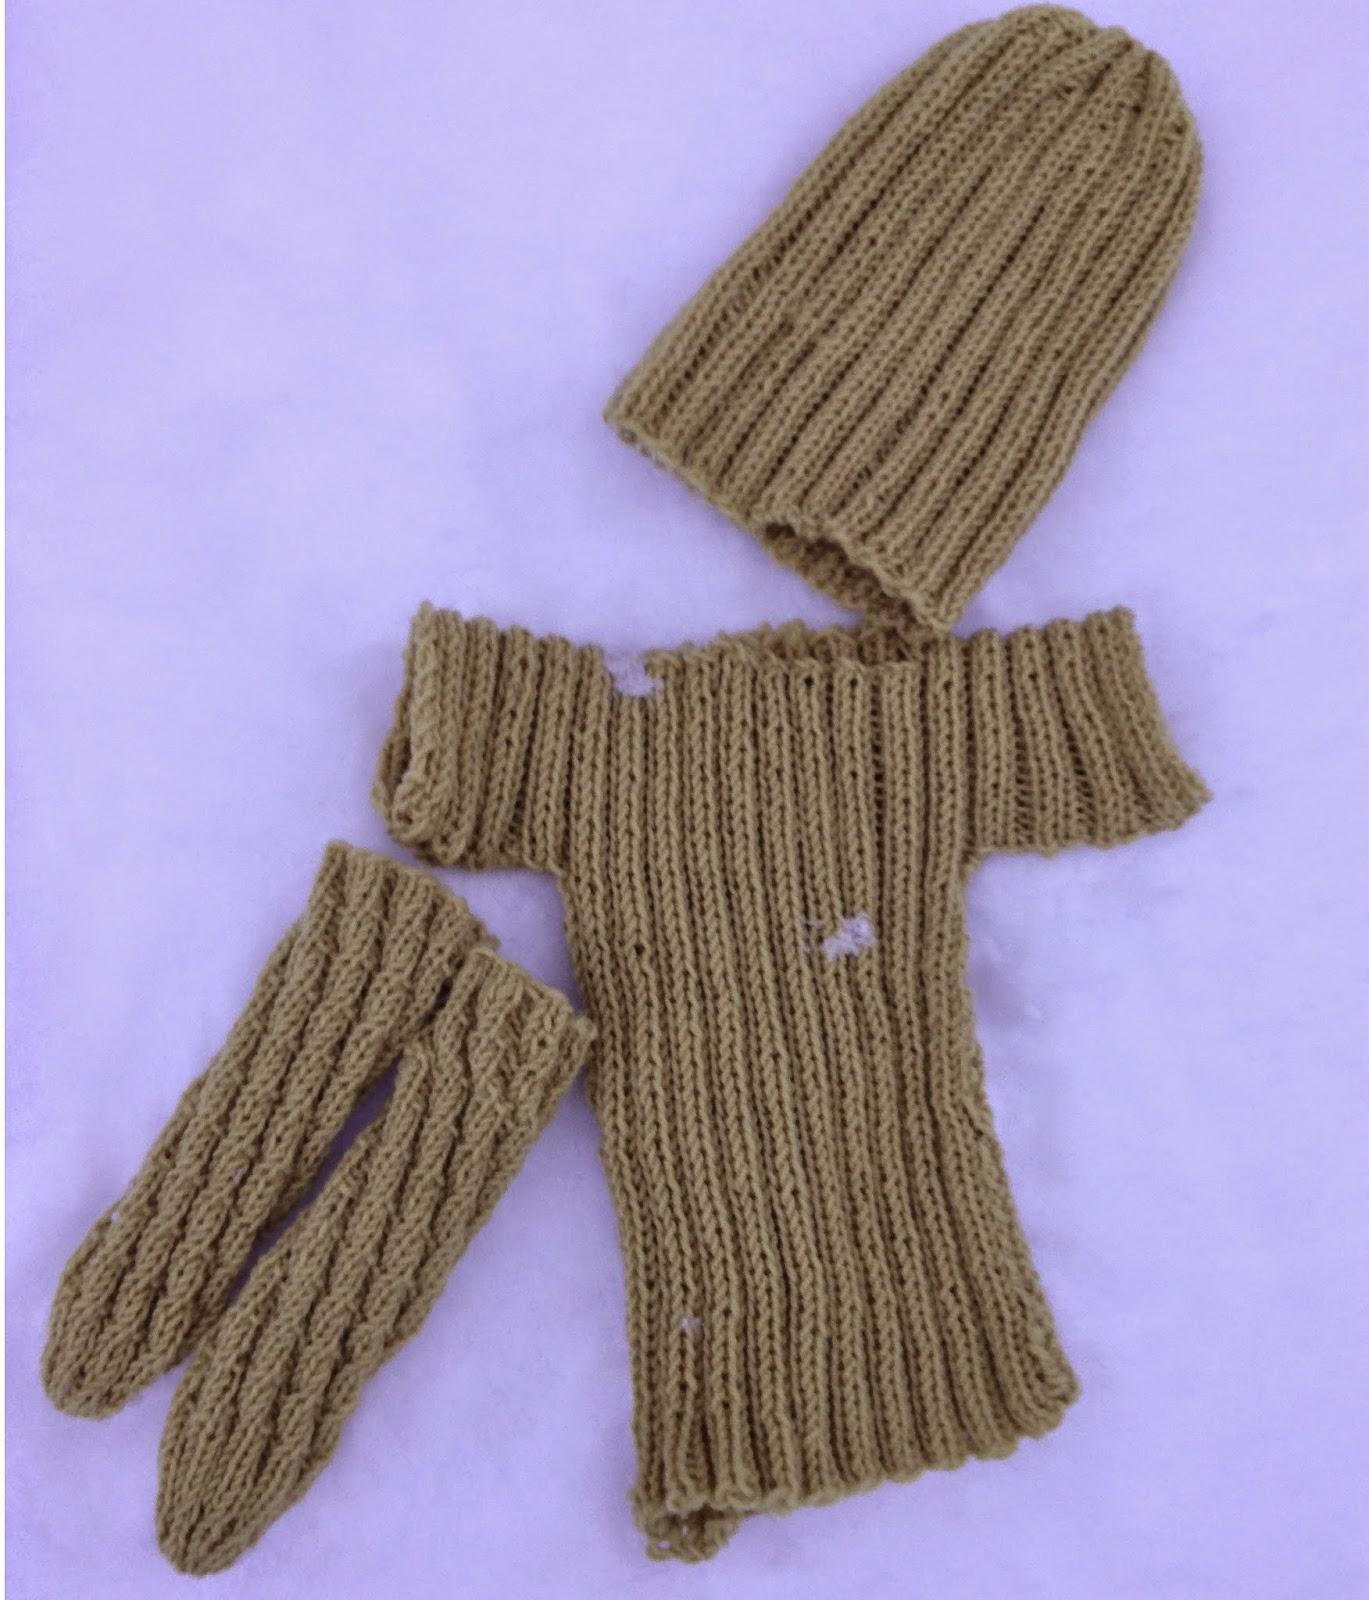 klær til premature barn